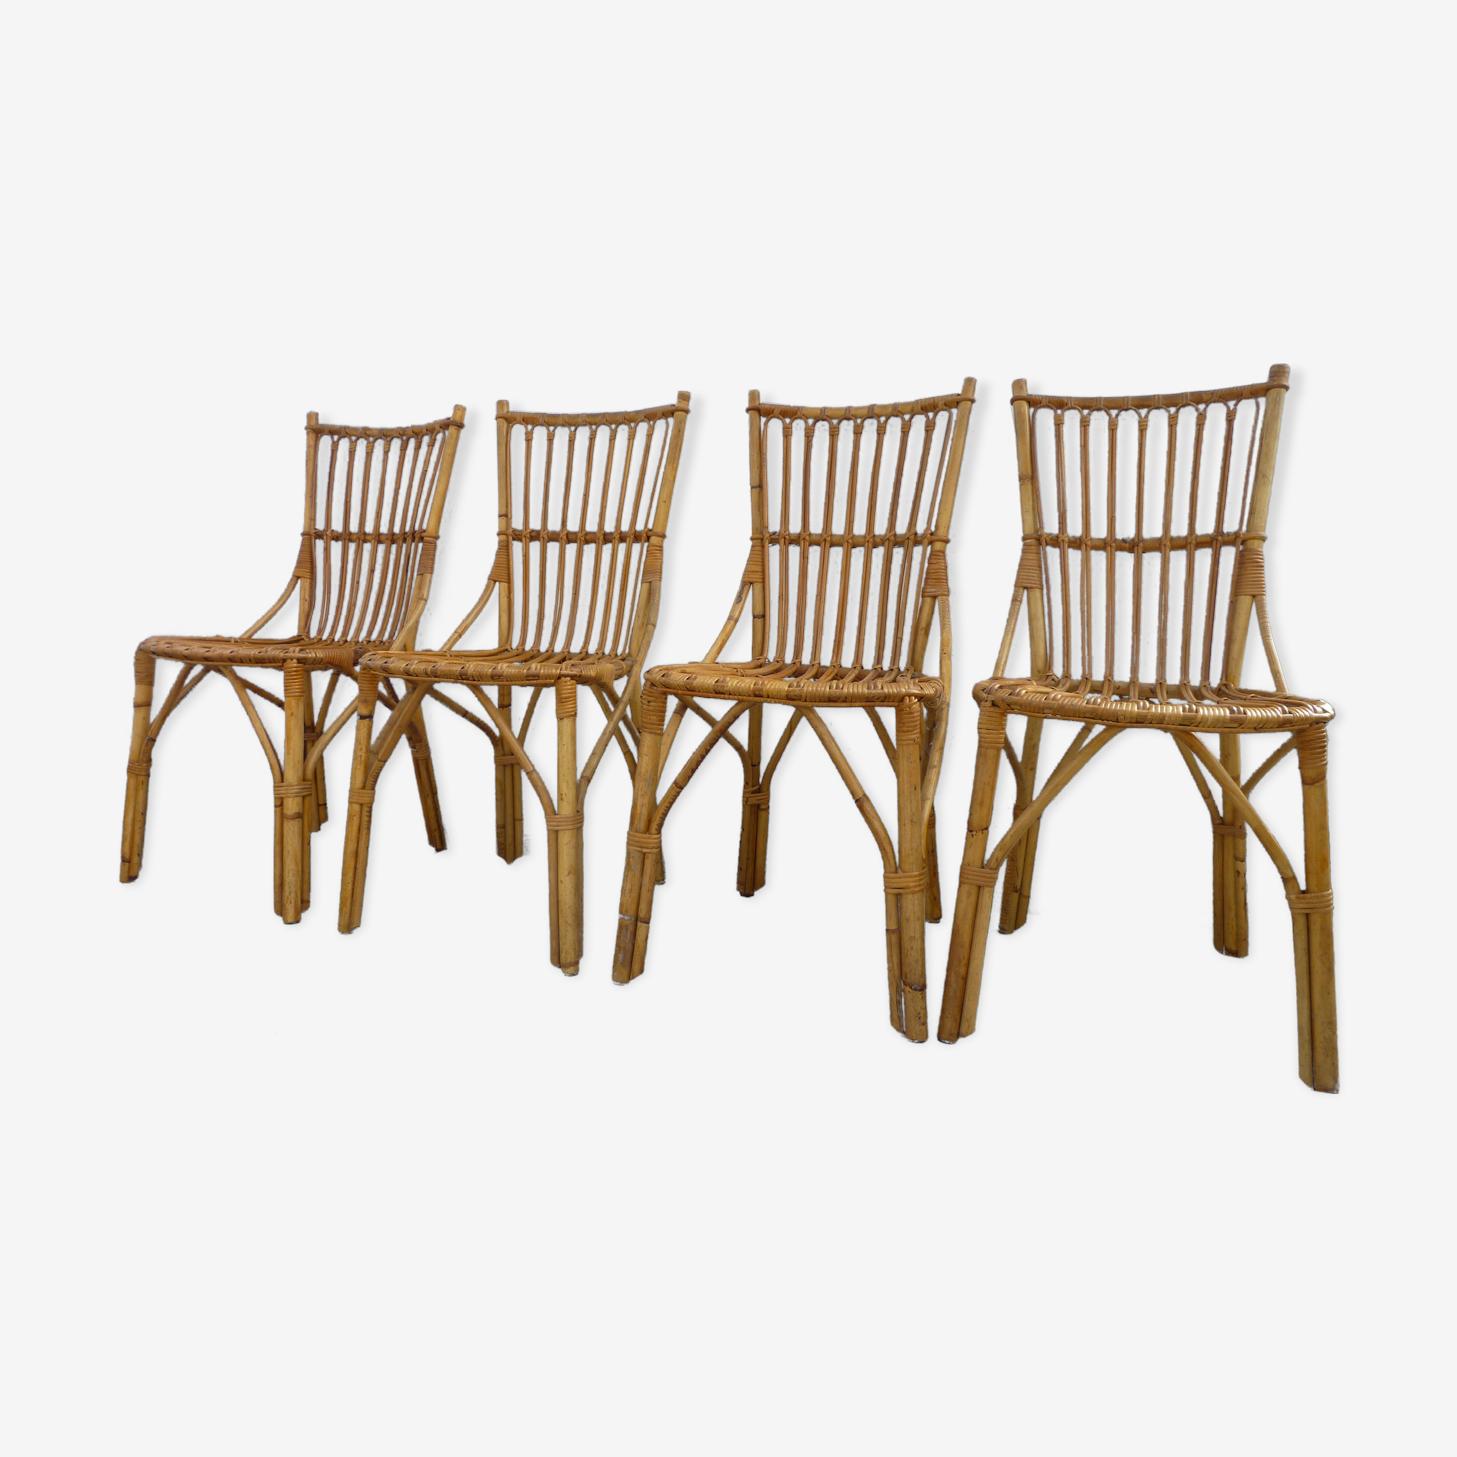 4 rattan chairs 50-60's